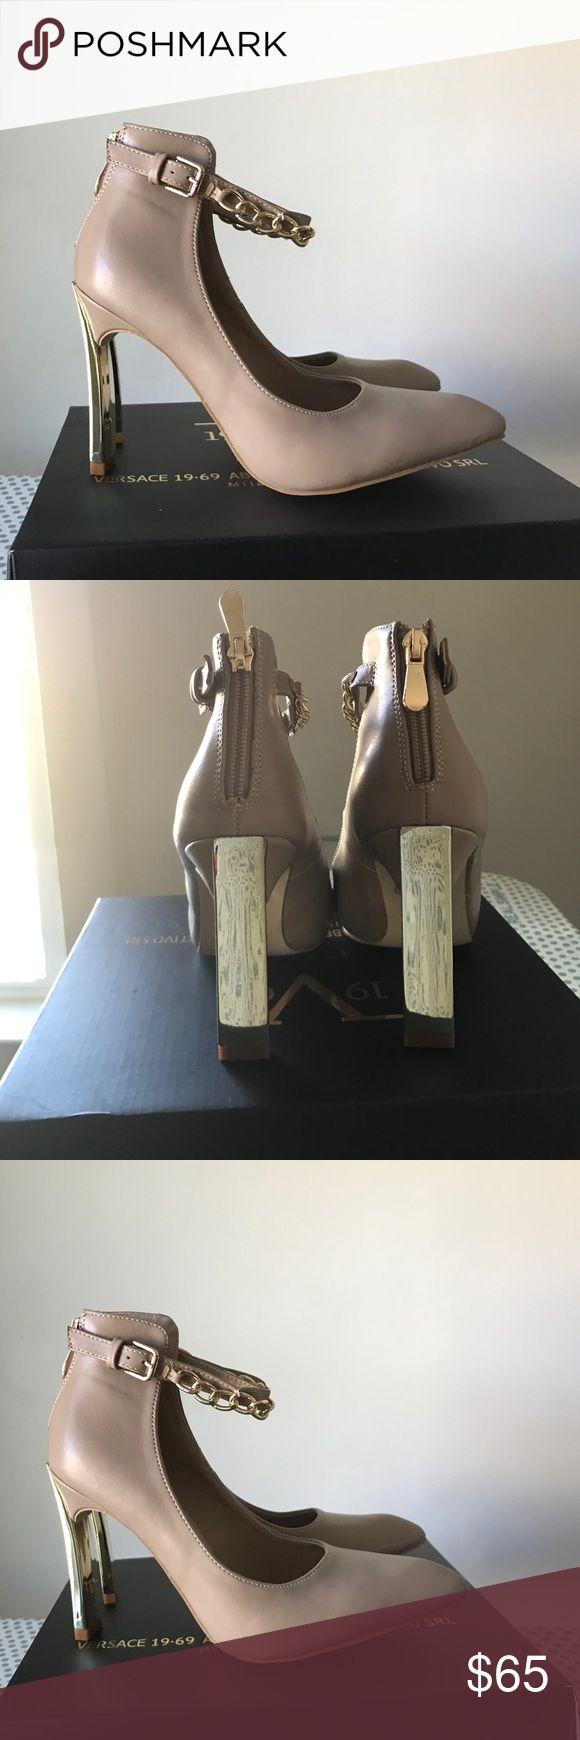 Versace 1969 Abbigliamento SPORTIVO srl 👠 NEW!!❣️ Versace 1969 Abbigliamento SPORTIVO srl 👠 NEW!!❣️nude color..gold tone heel Versace 1969 Abbigliamento SPORTIVO srl 👠  Shoes